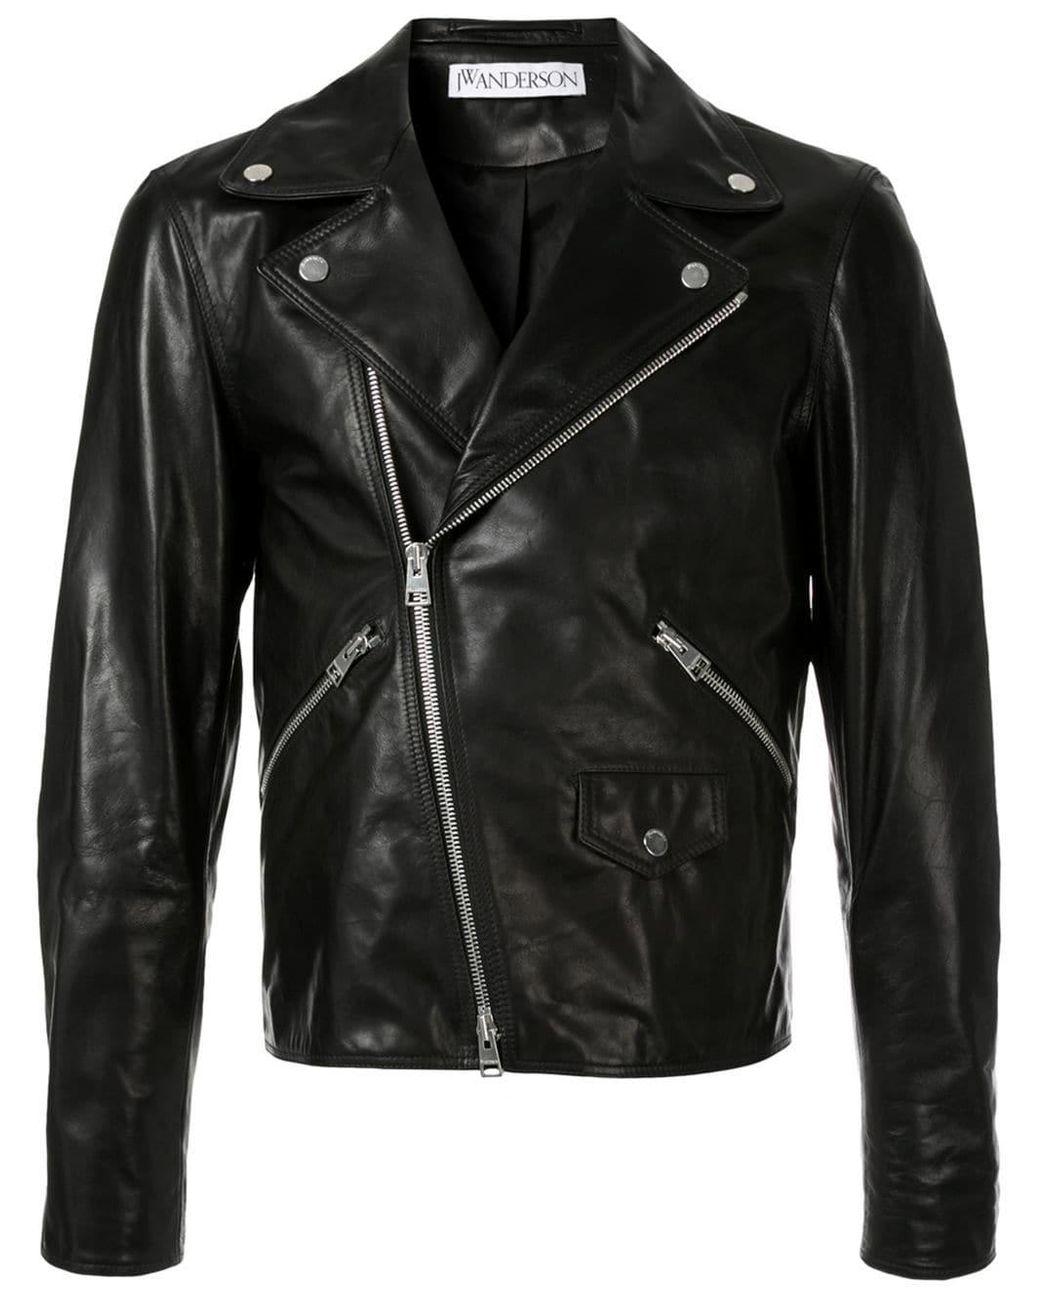 Lyst - JW Anderson Lightweight Leather Jacket in Black for Men